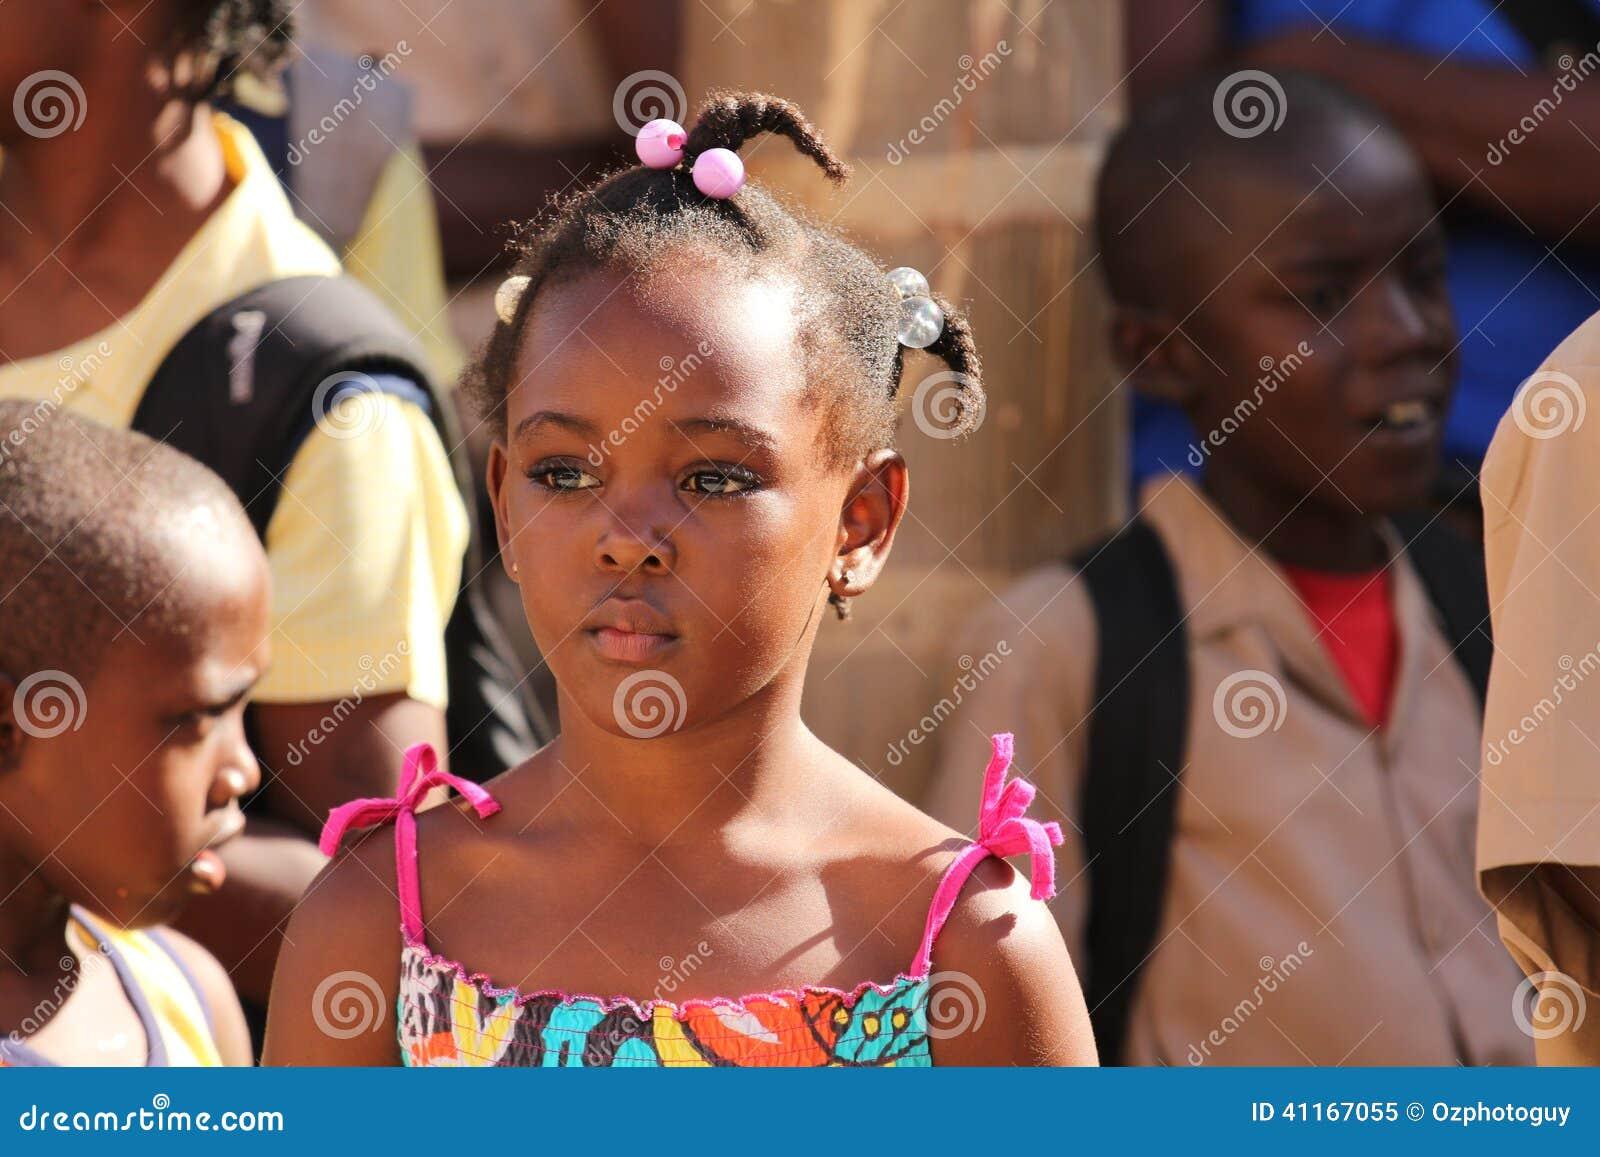 Girls pretty jamaican Dating Jamaican